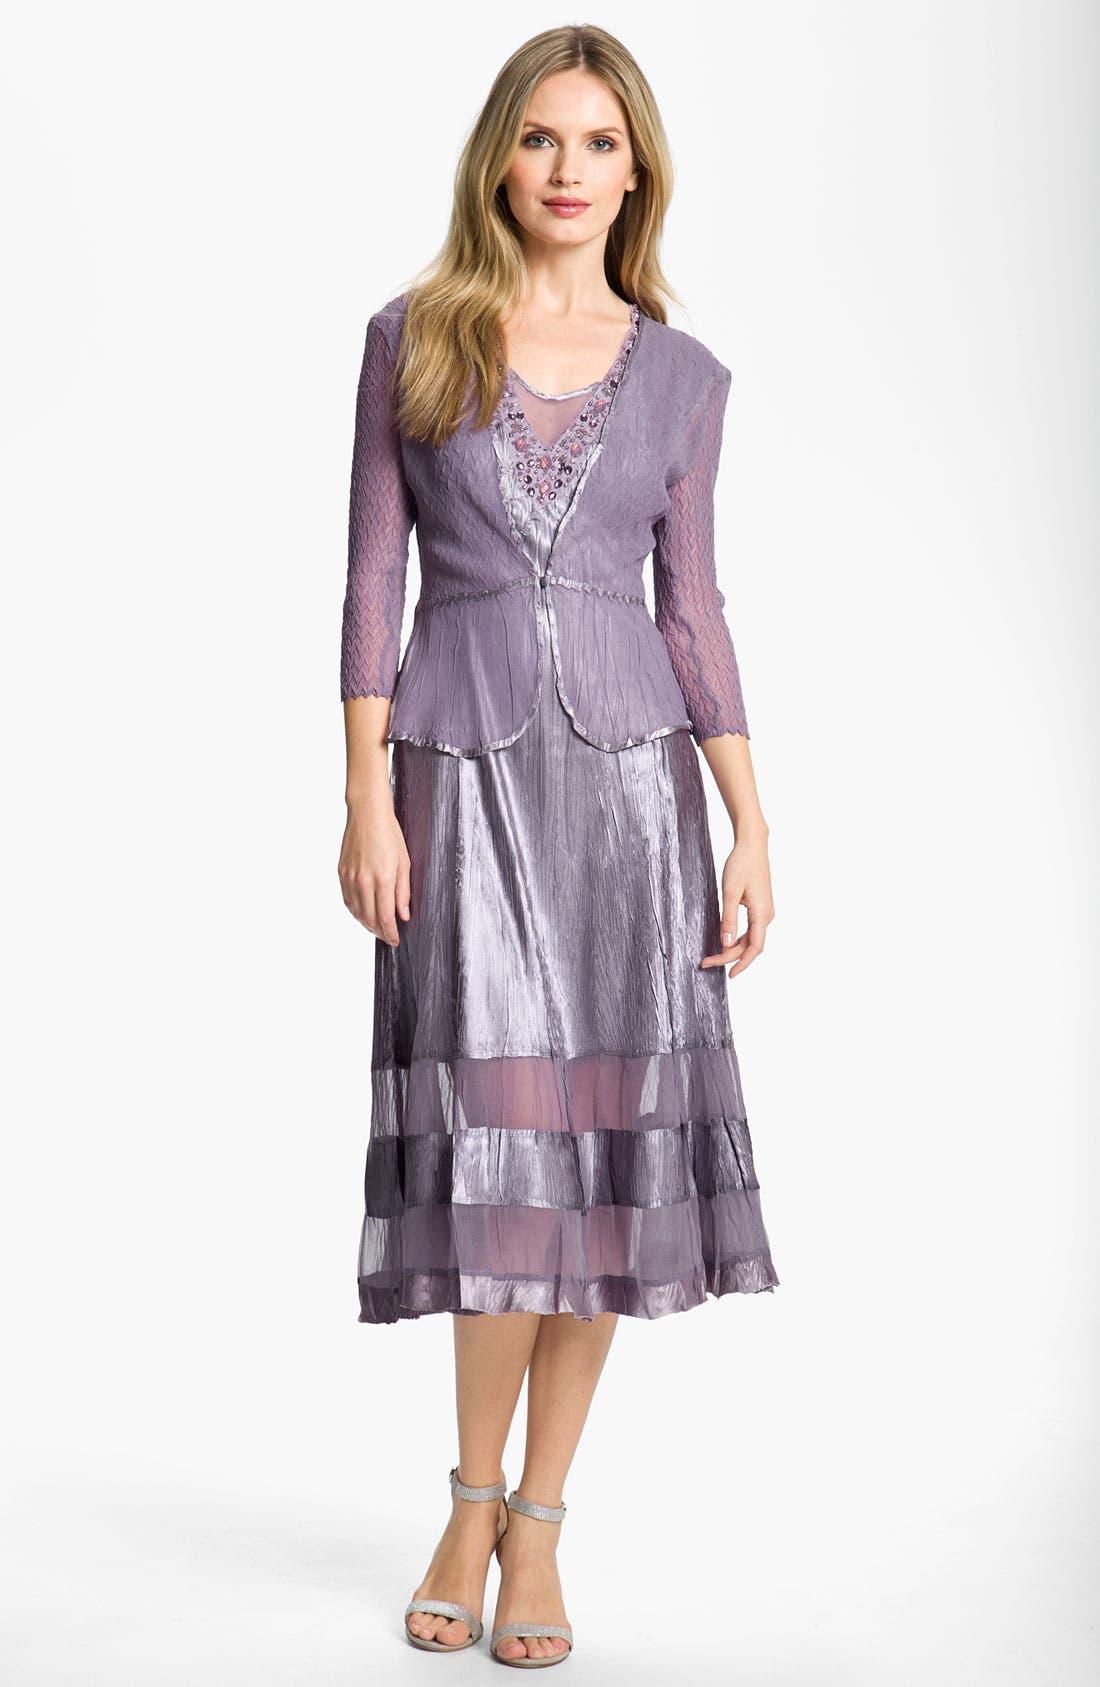 Alternate Image 1 Selected - Komarov Sheer Panel Charmeuse Dress & Chiffon Jacket